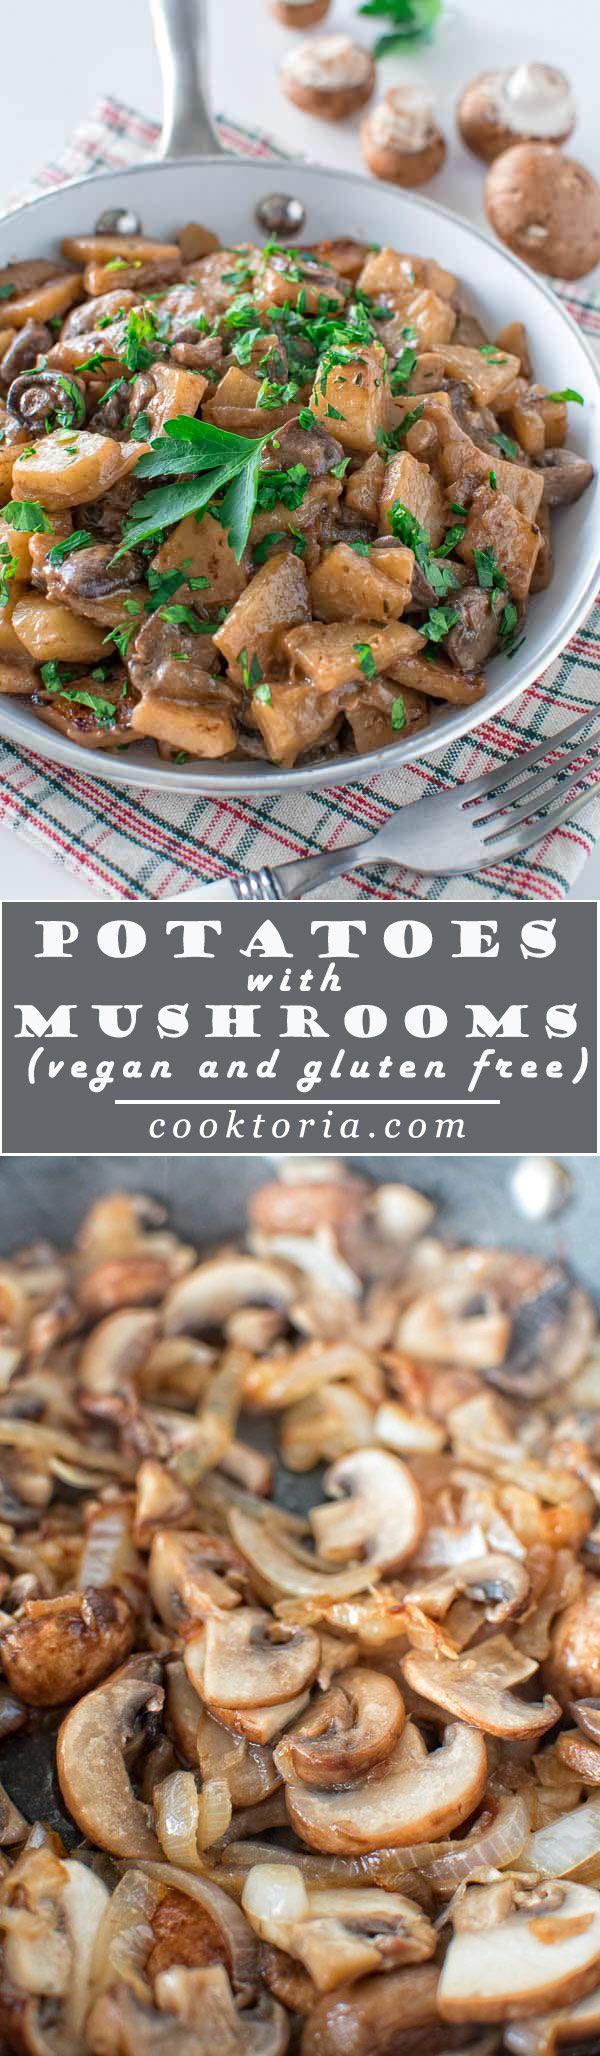 Ultimate 1-pot vegetarian/vegan dinner! Delightful potatoes with mushrooms cooked to perfection in creamy coconut milk. ❤ COOKTORIA.COM